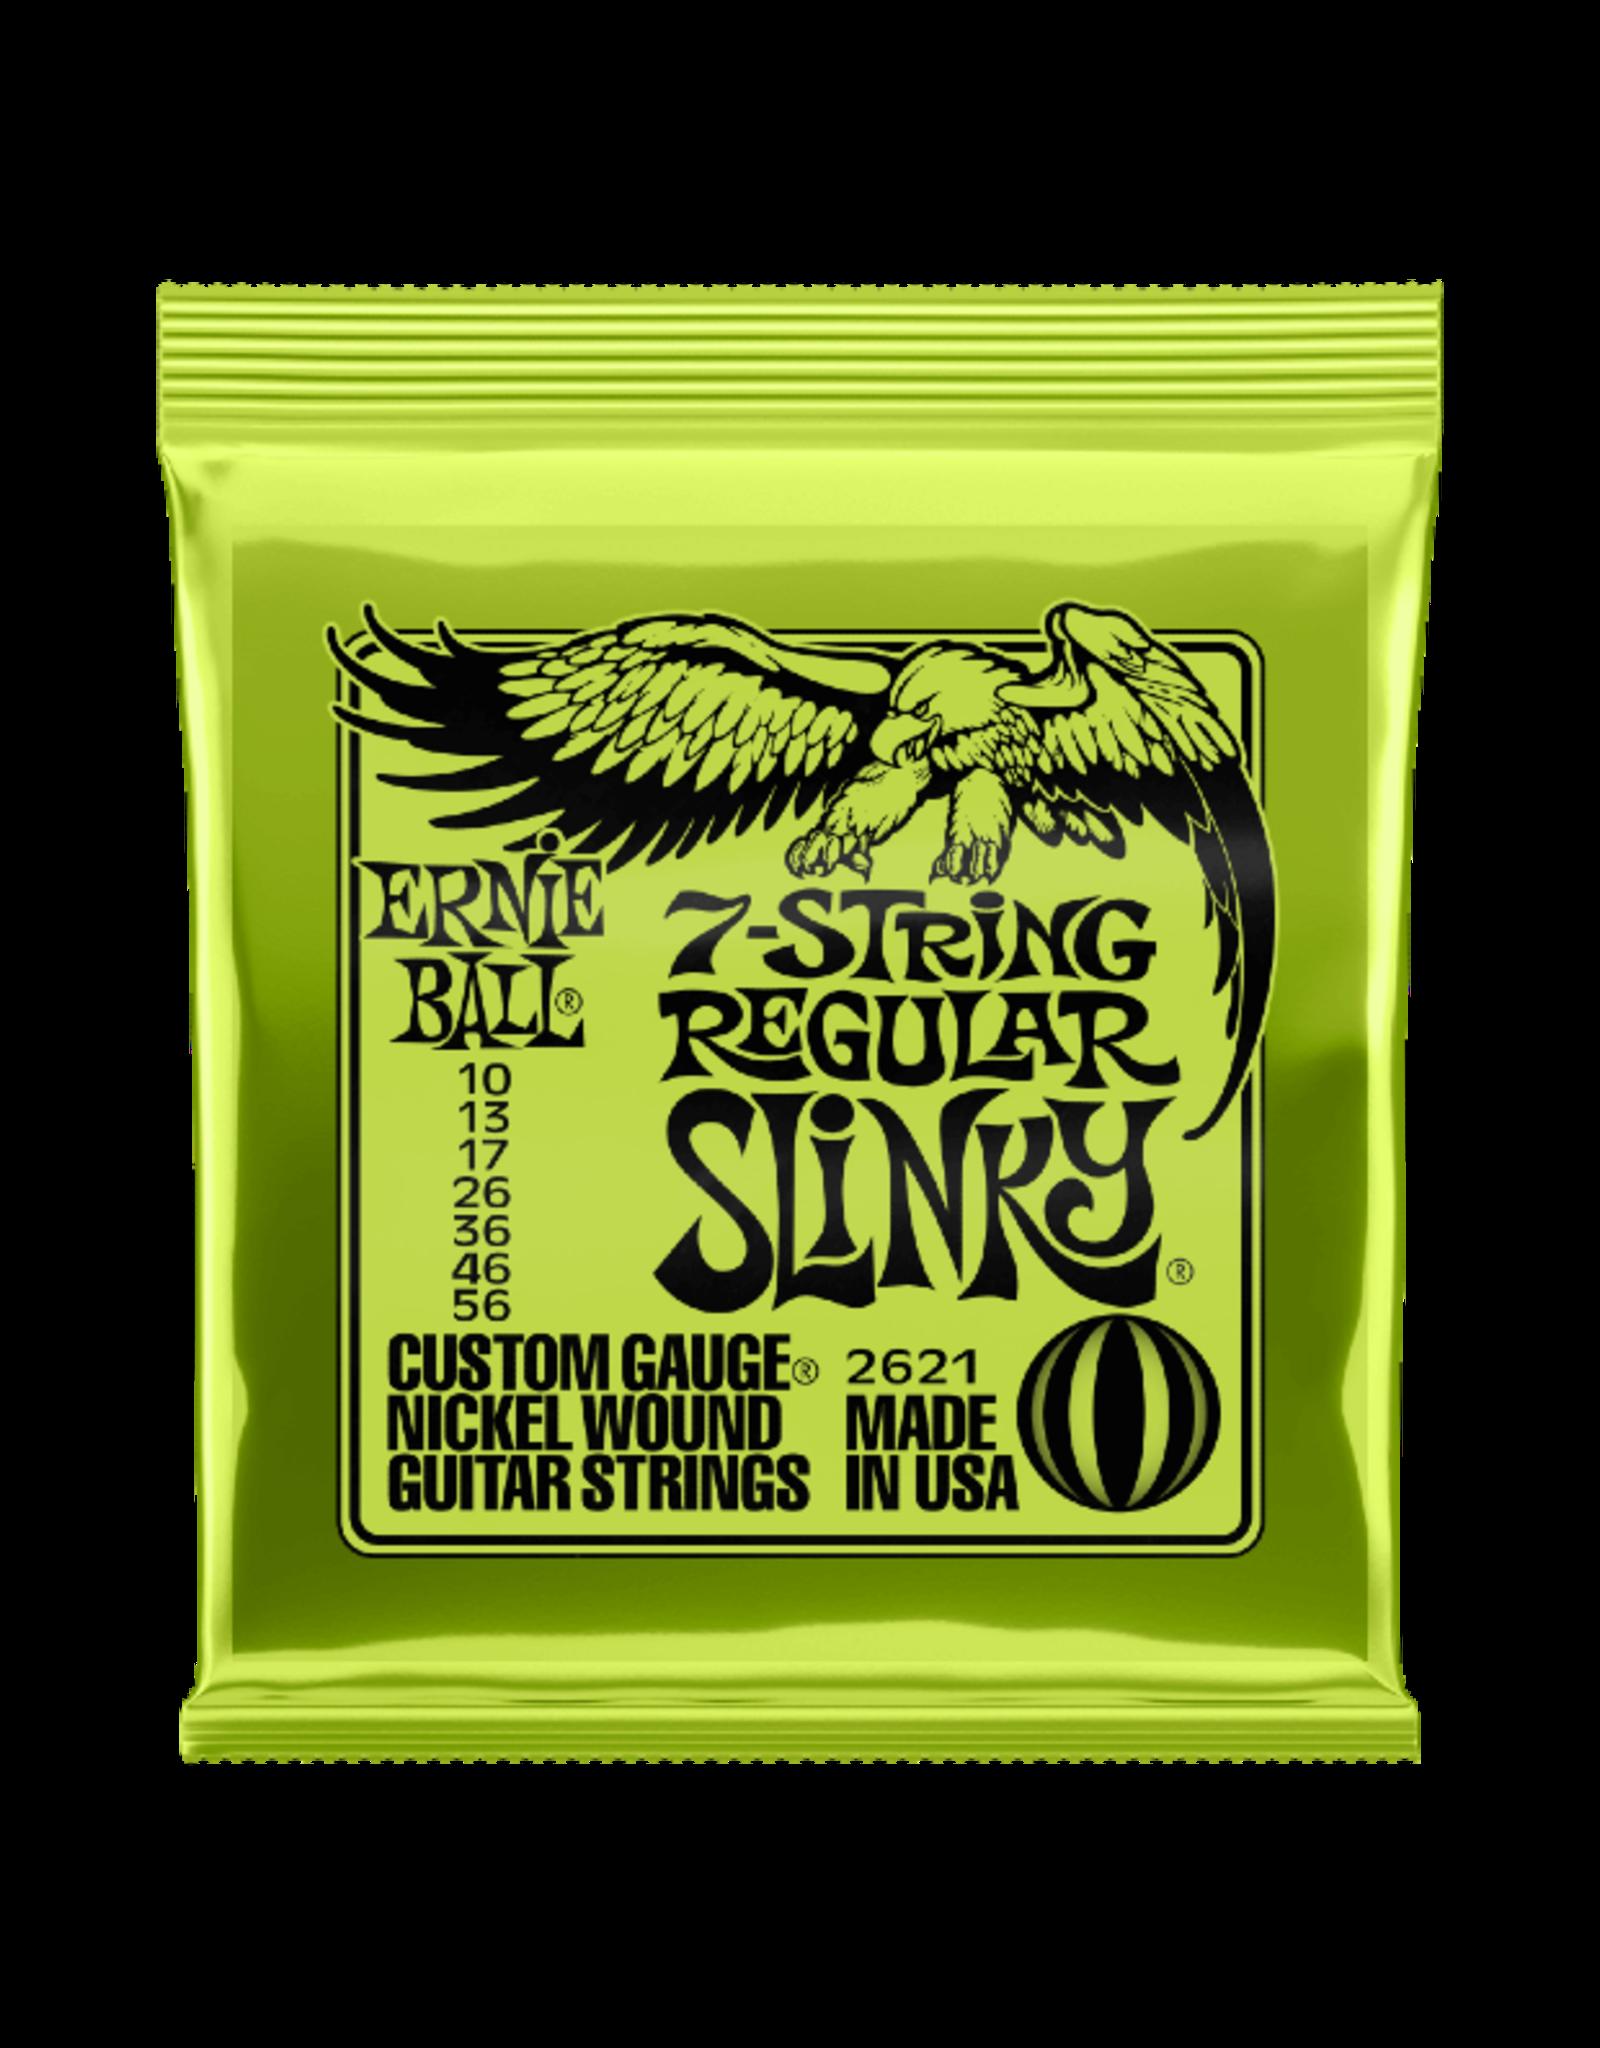 Ernie Ball Ernie Ball Regular Slinky 7-String Nickel Wound  10-56 Gauge